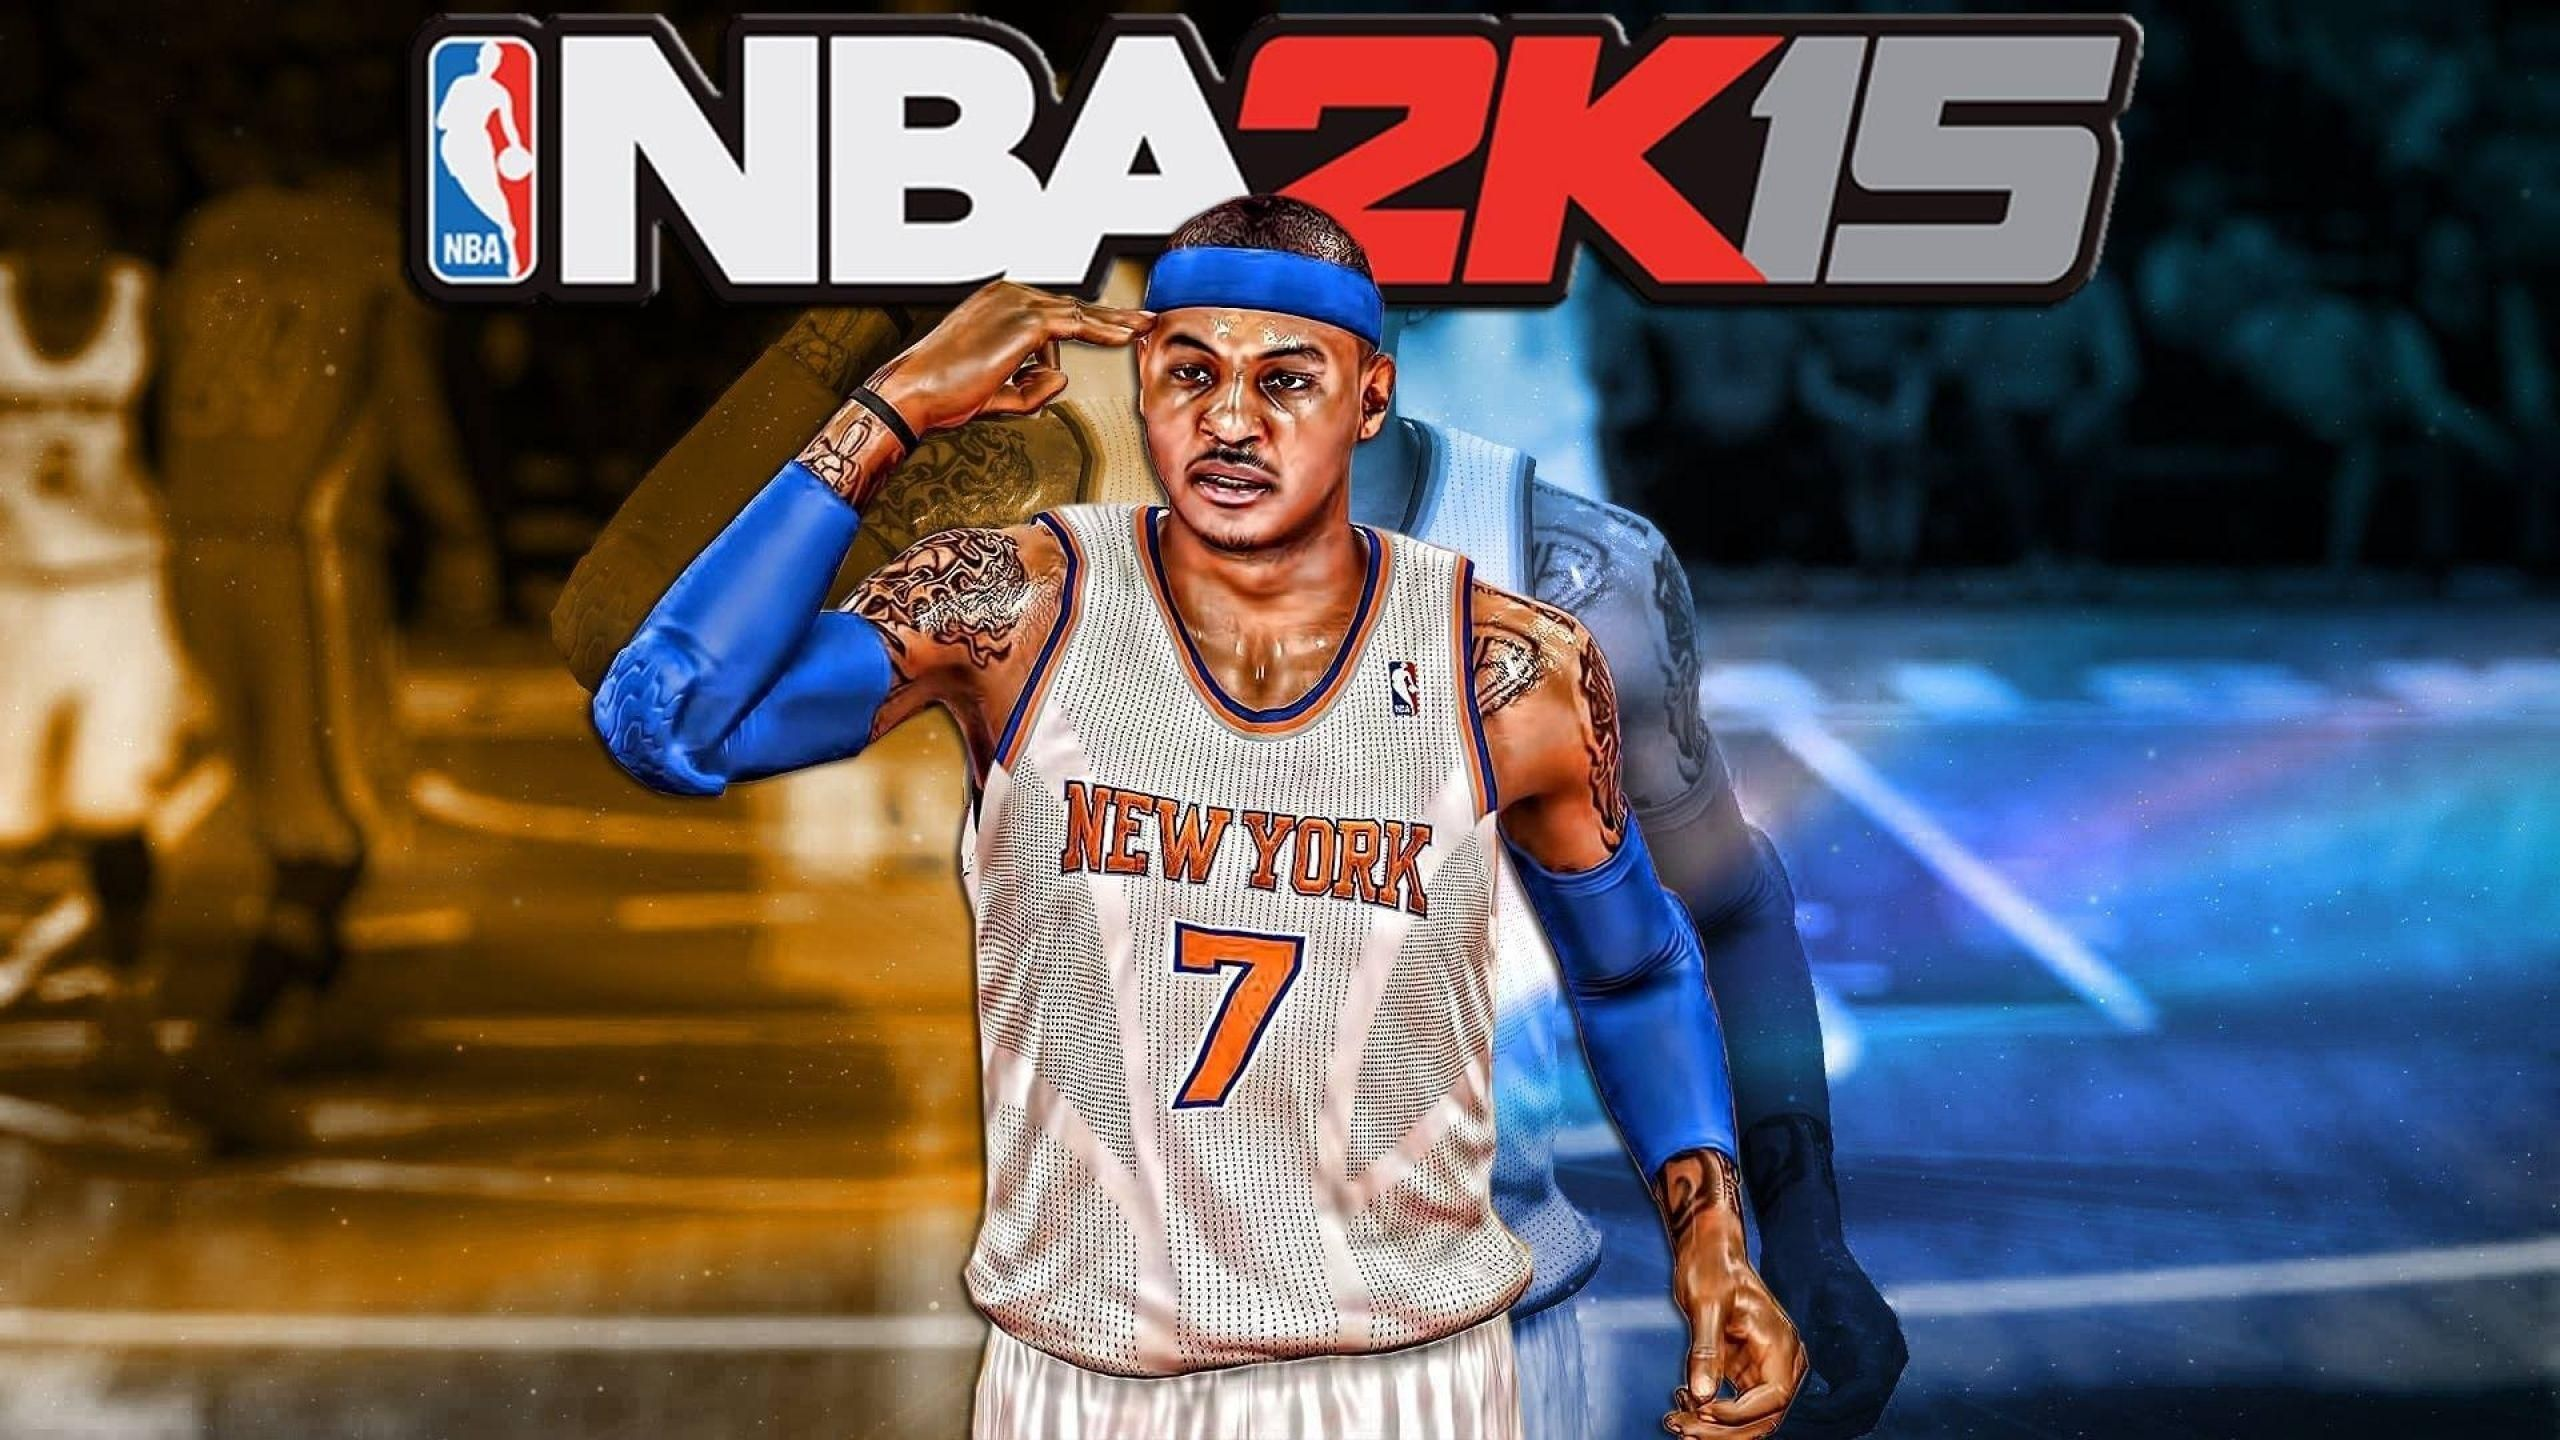 11 Of Cool Nba 2k Wallpaper In 2020 Wallpaper Nba New York Knicks